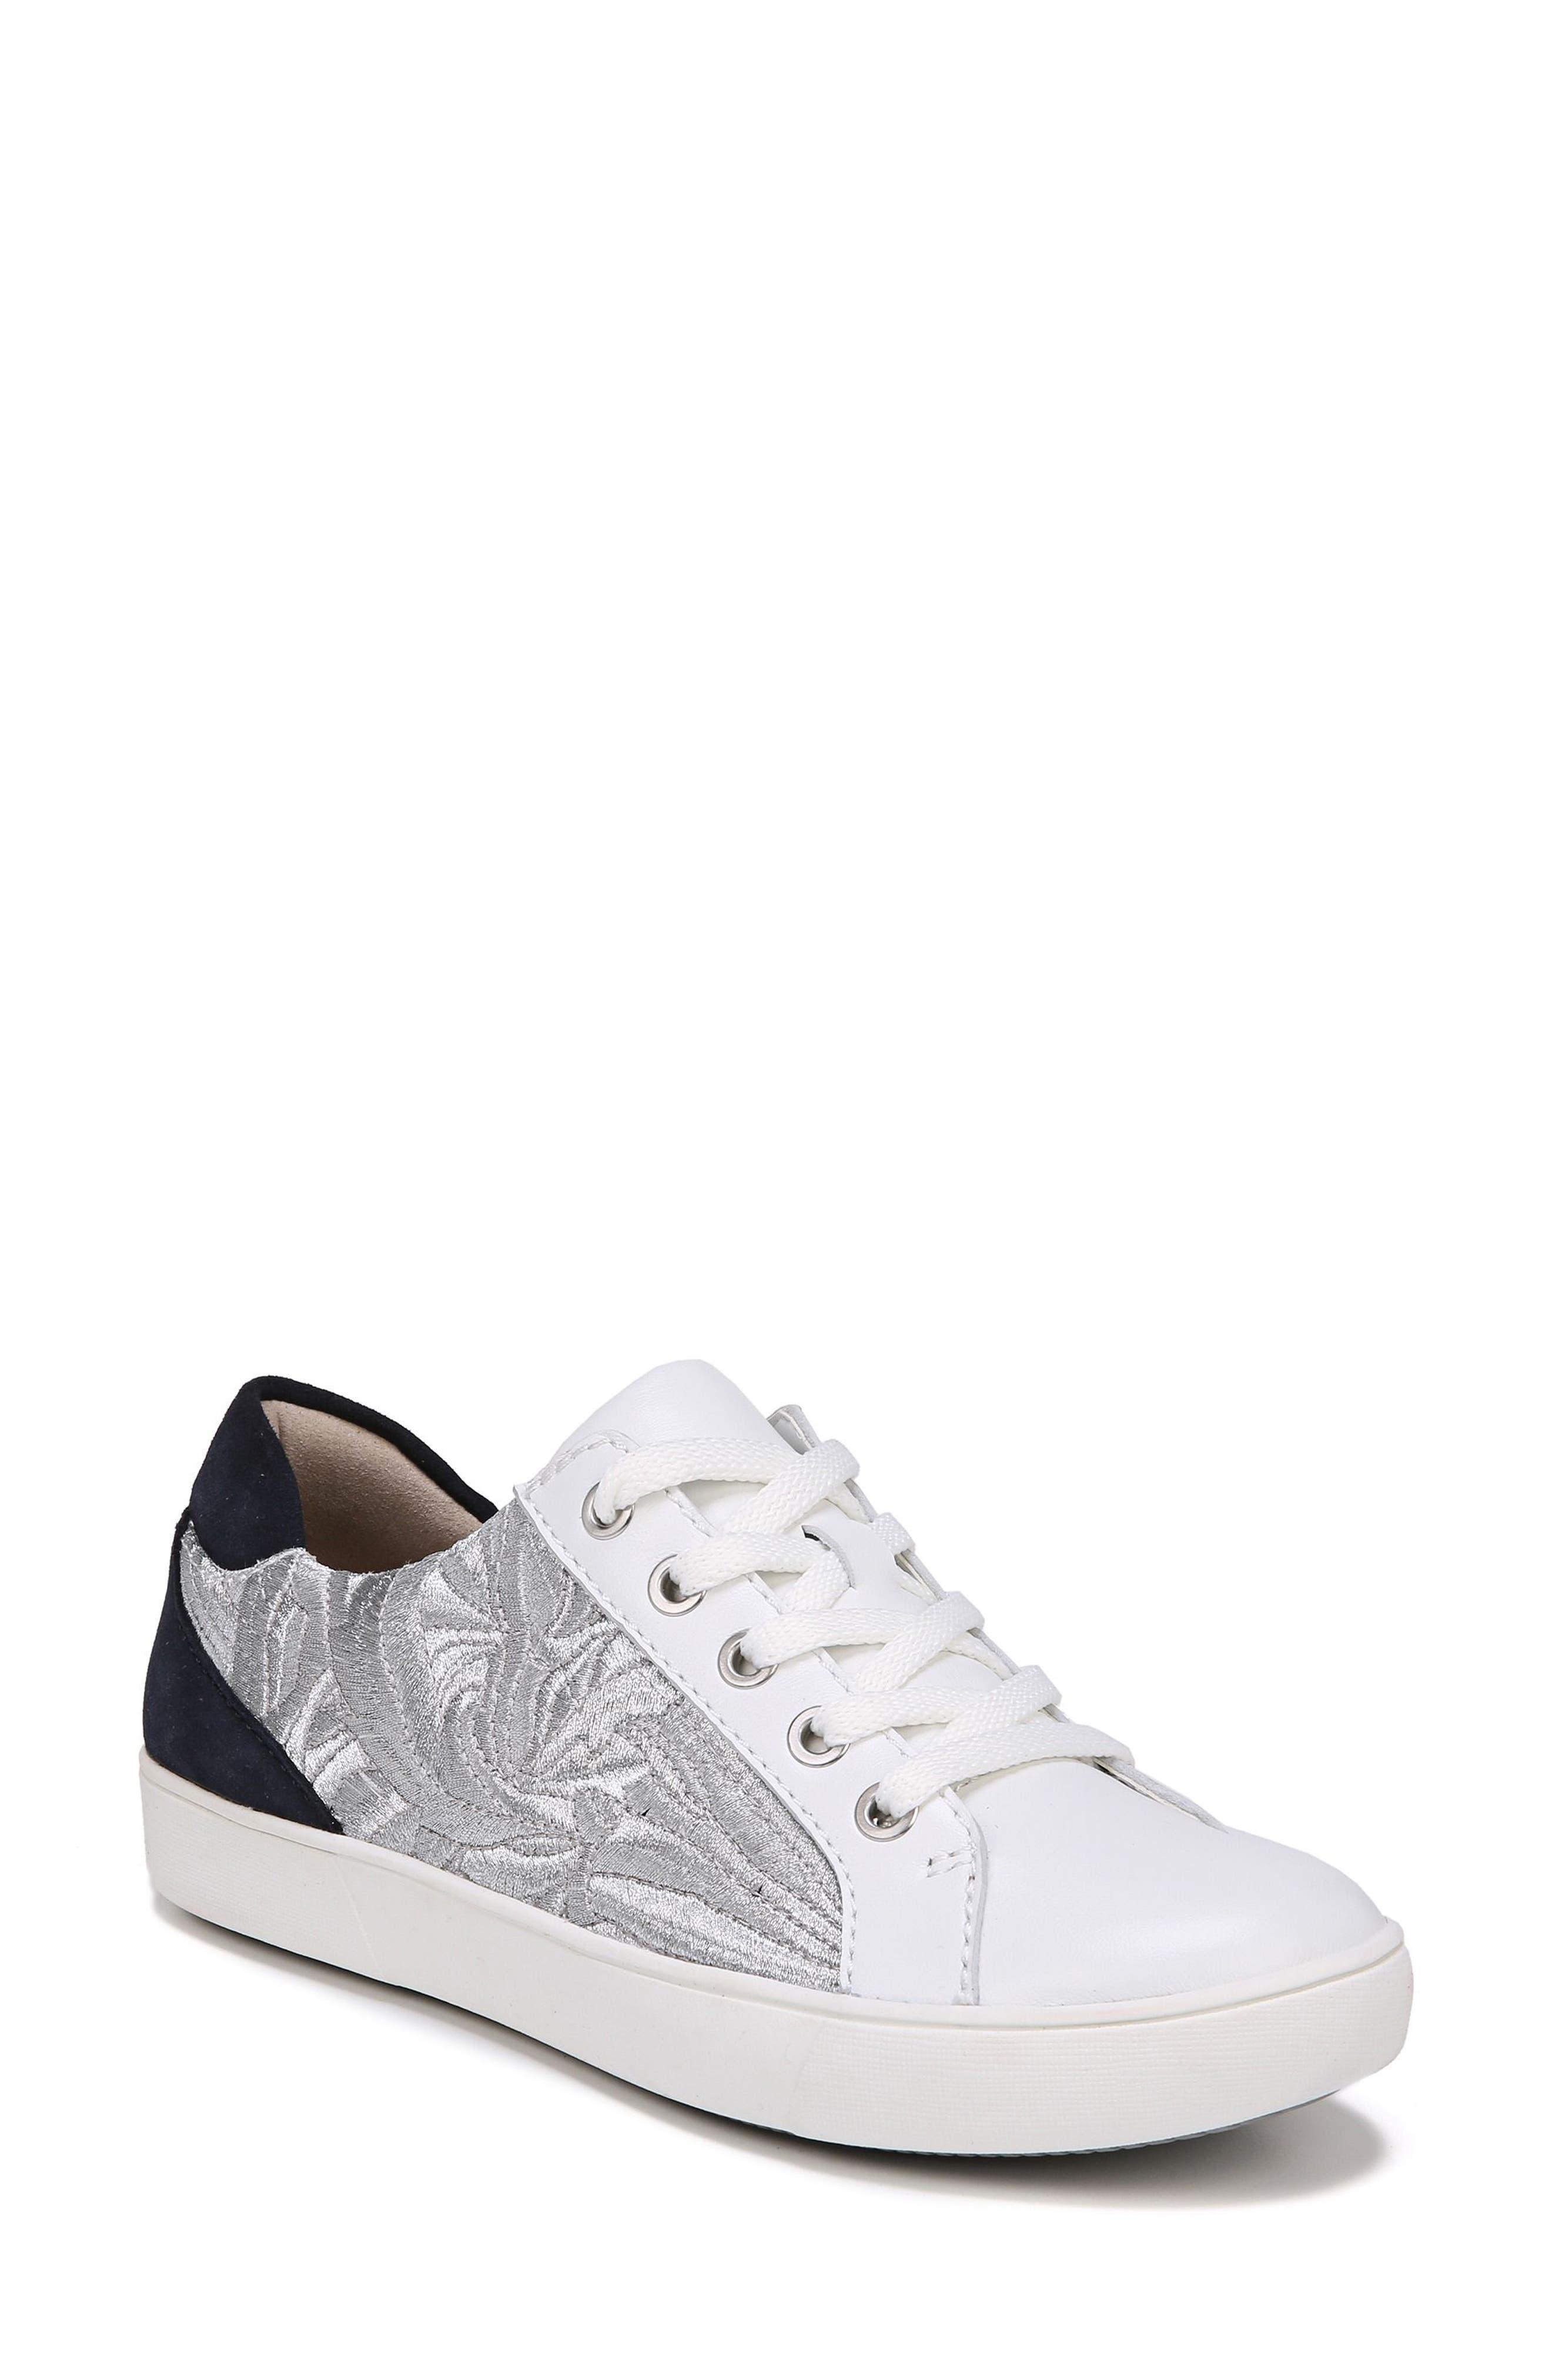 Morrison Sneaker,                             Main thumbnail 1, color,                             White/ Silver Leather